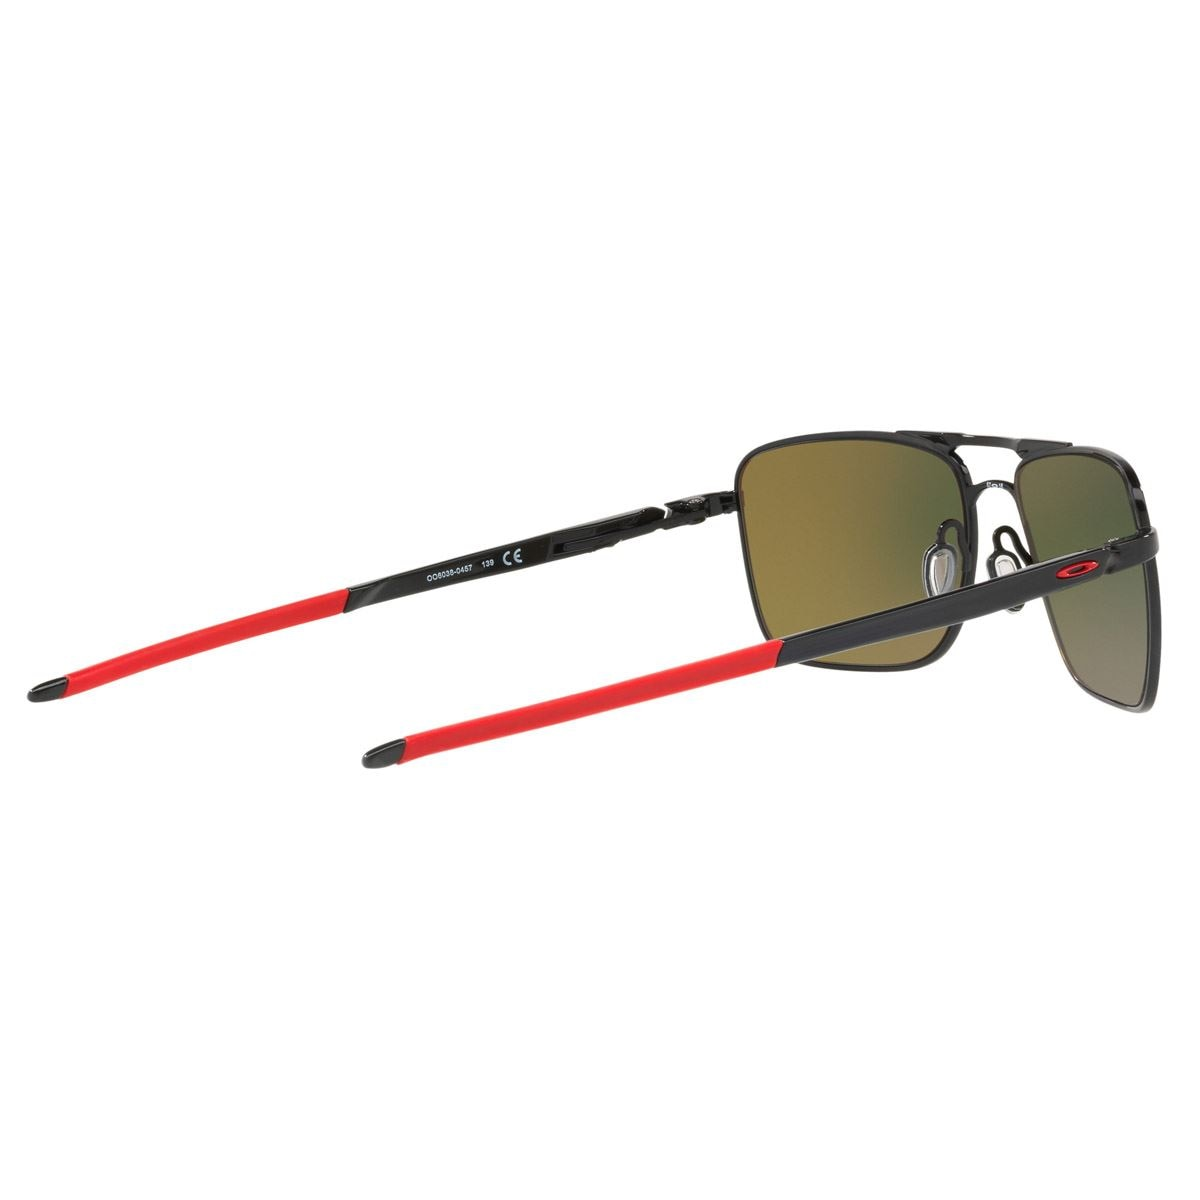 Oakley gauge 6 prizm bronce-rubí armazón negro  - Sanborns